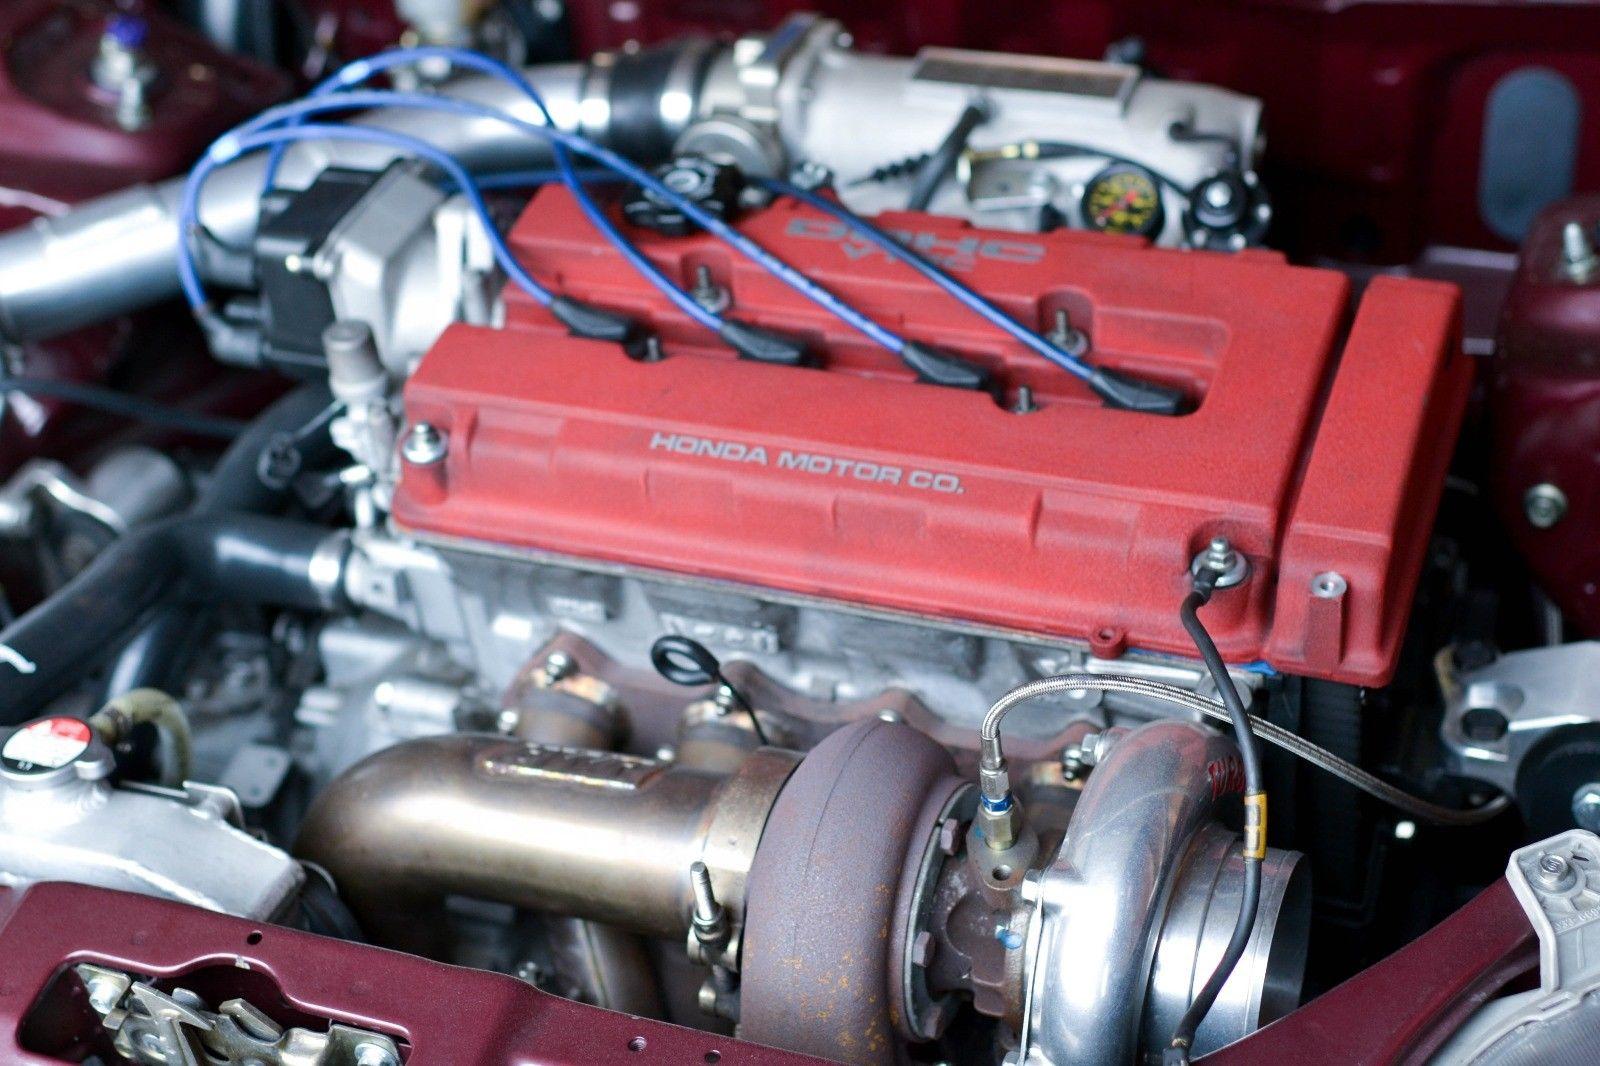 Civic Ex Turbo >> Great 1998 Honda Civic Right Hand Drive Jdm Gsr Engine 1998 Honda Civic Ex Turbo 1 8 Gsr 2018 2019